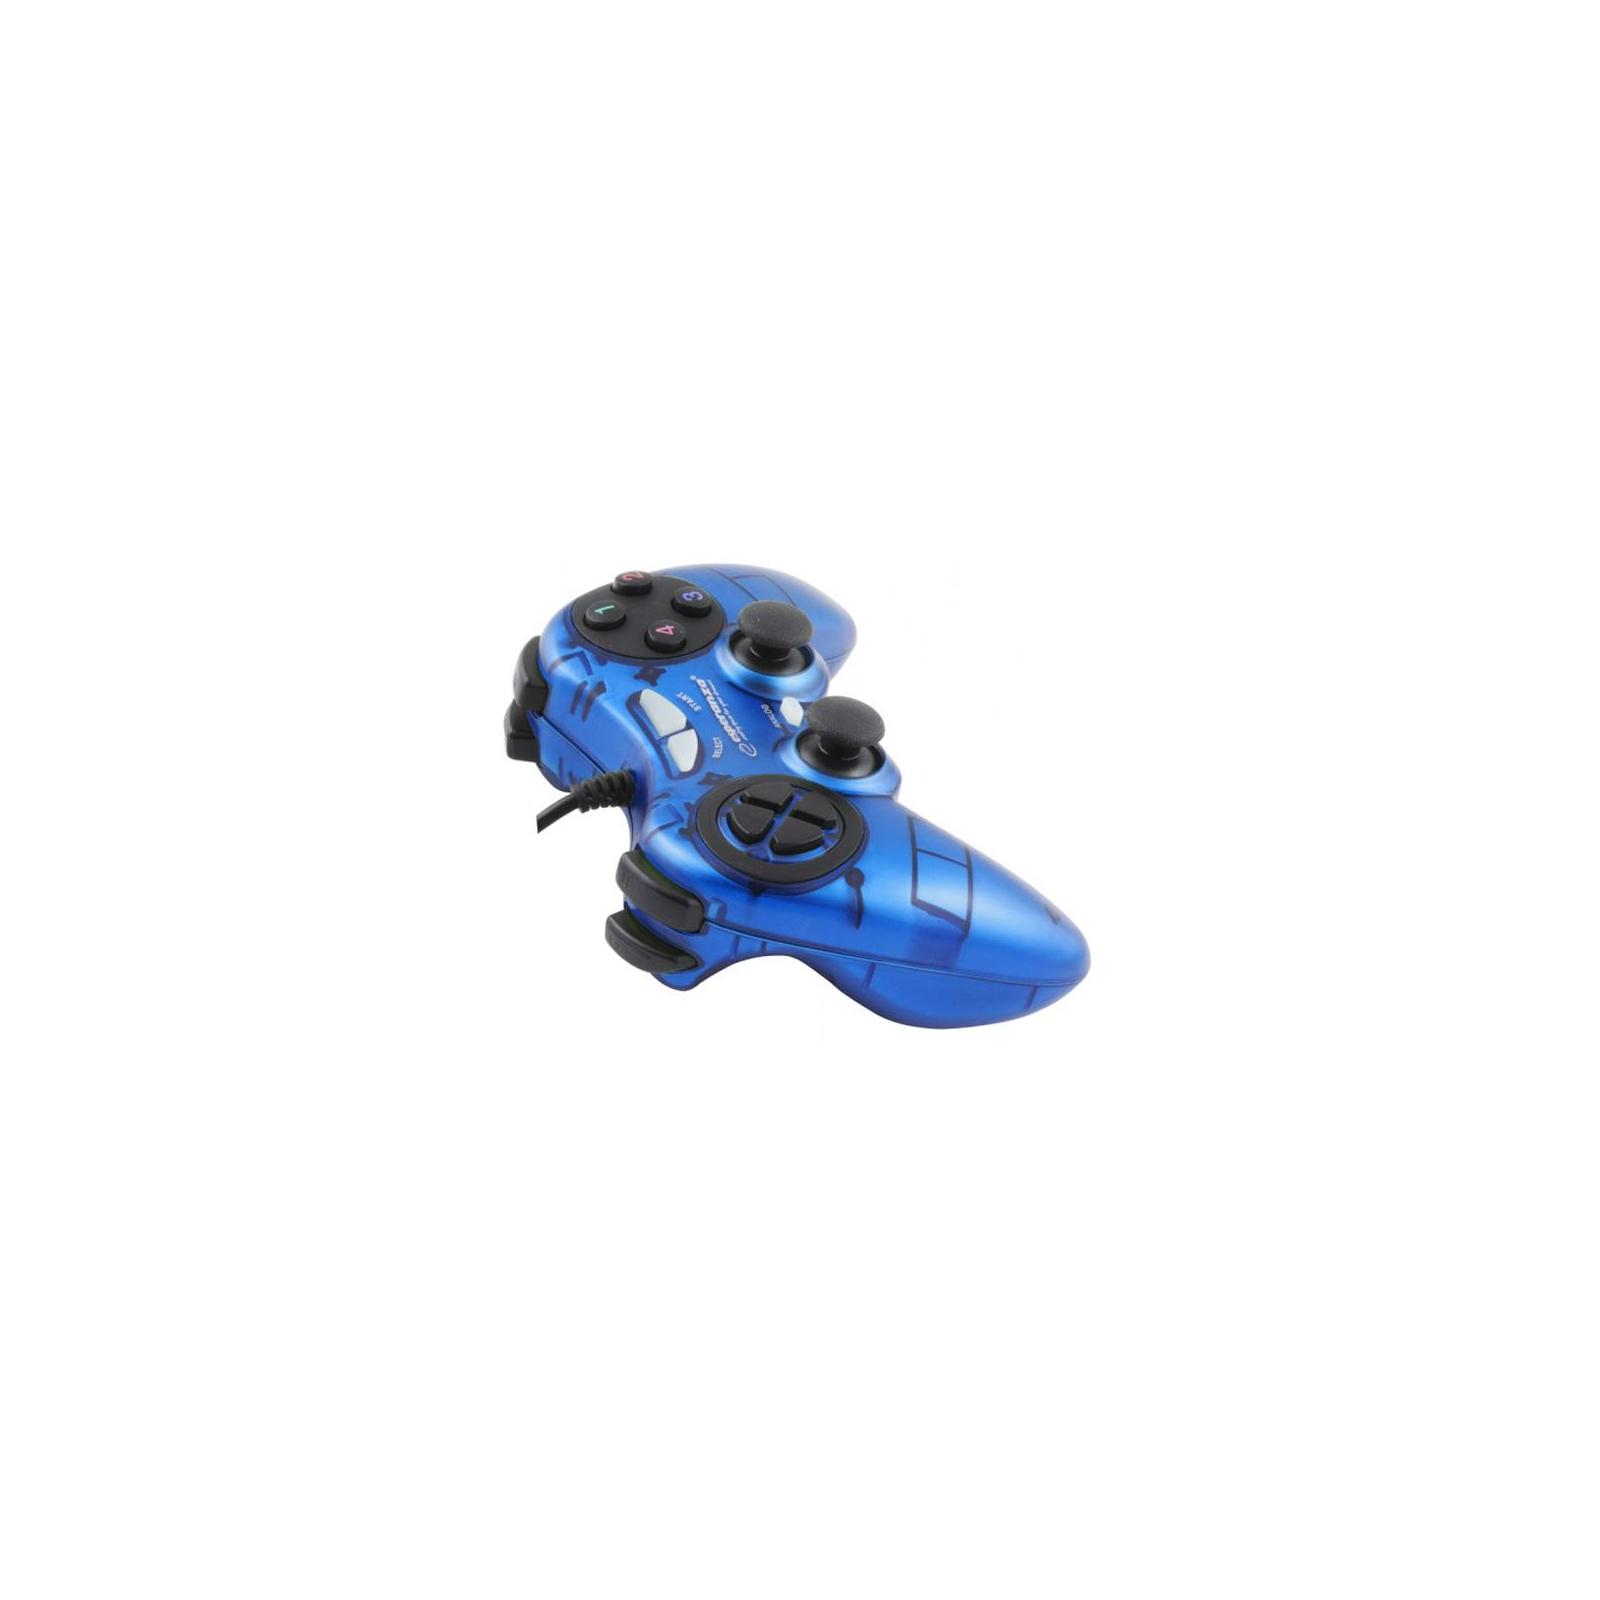 Геймпад Esperanza Fighter PC Blue (EGG105B) изображение 2